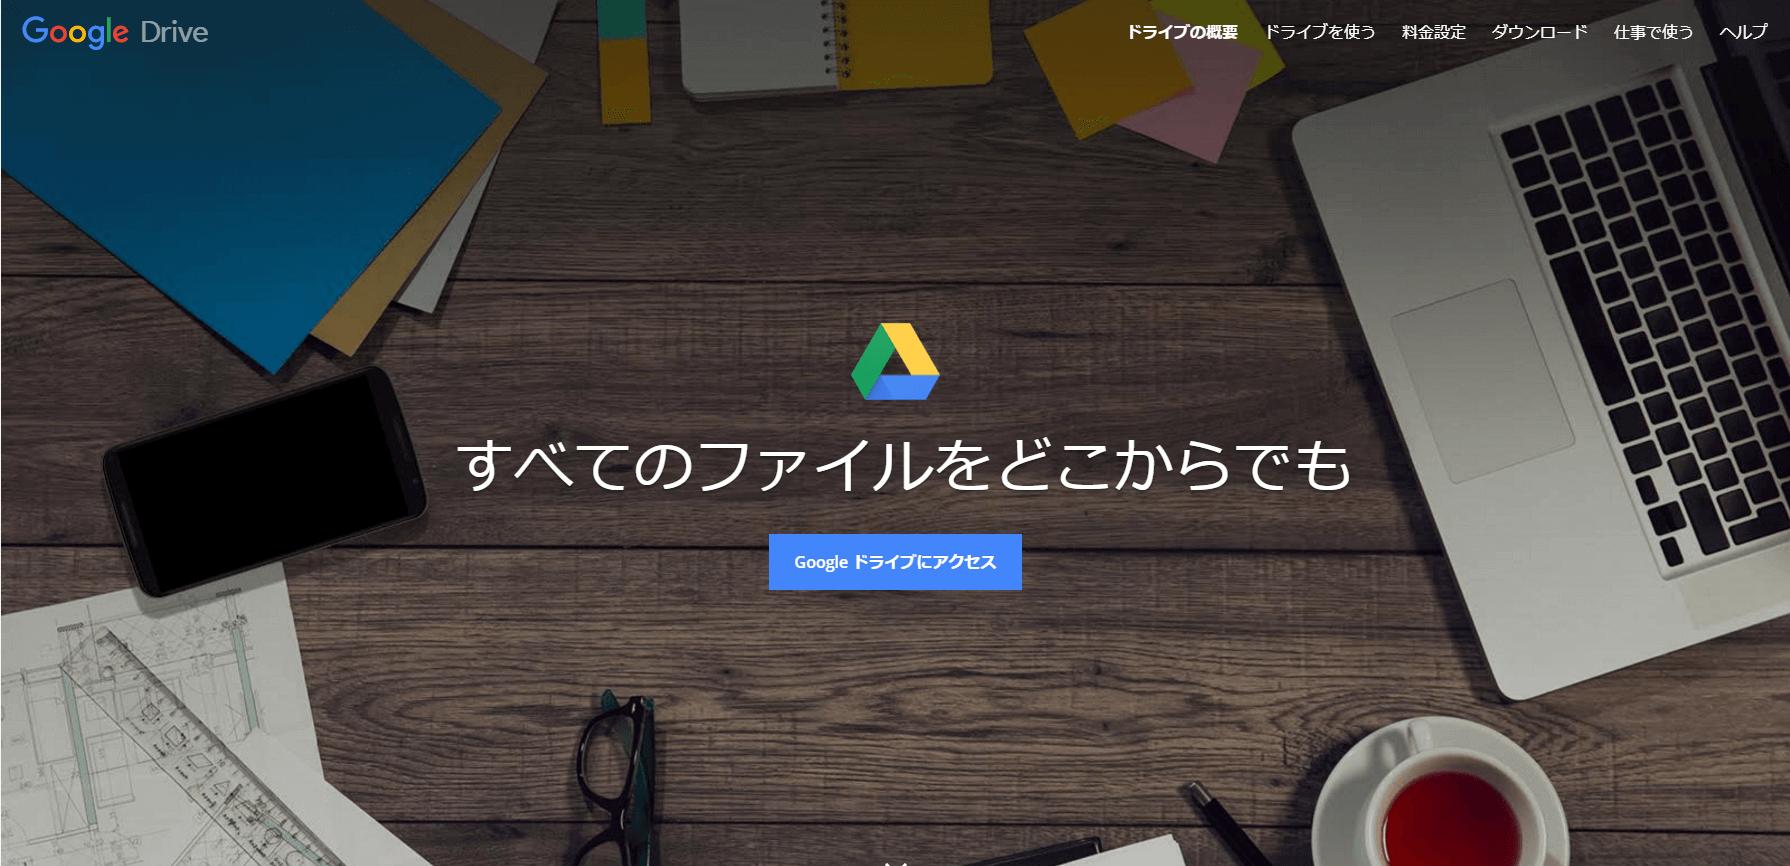 GoogleDrive(グーグルドライブ)のアプリが終了。サービスは継続。